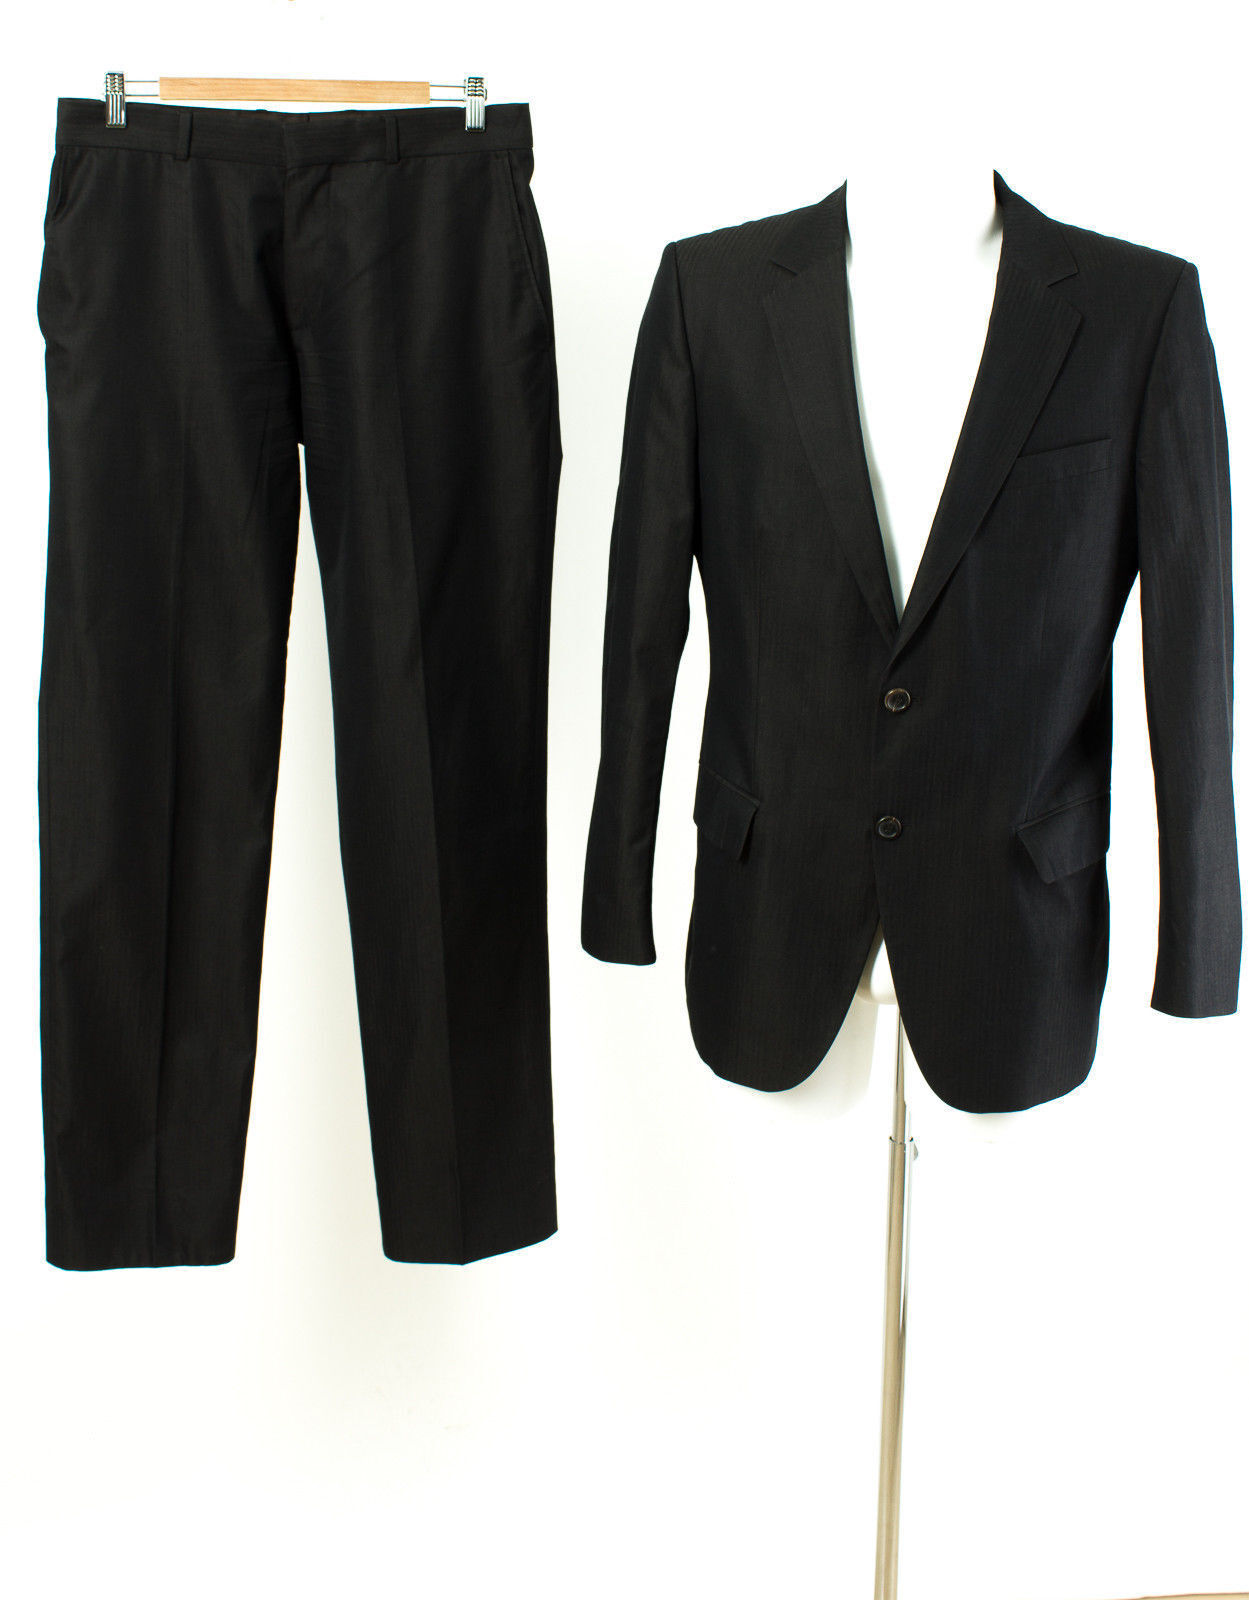 HUGO BOSS ROT LABEL Anzug Gr. 48 / S 100% Baumwolle Sakko Hose Geschäft Suit